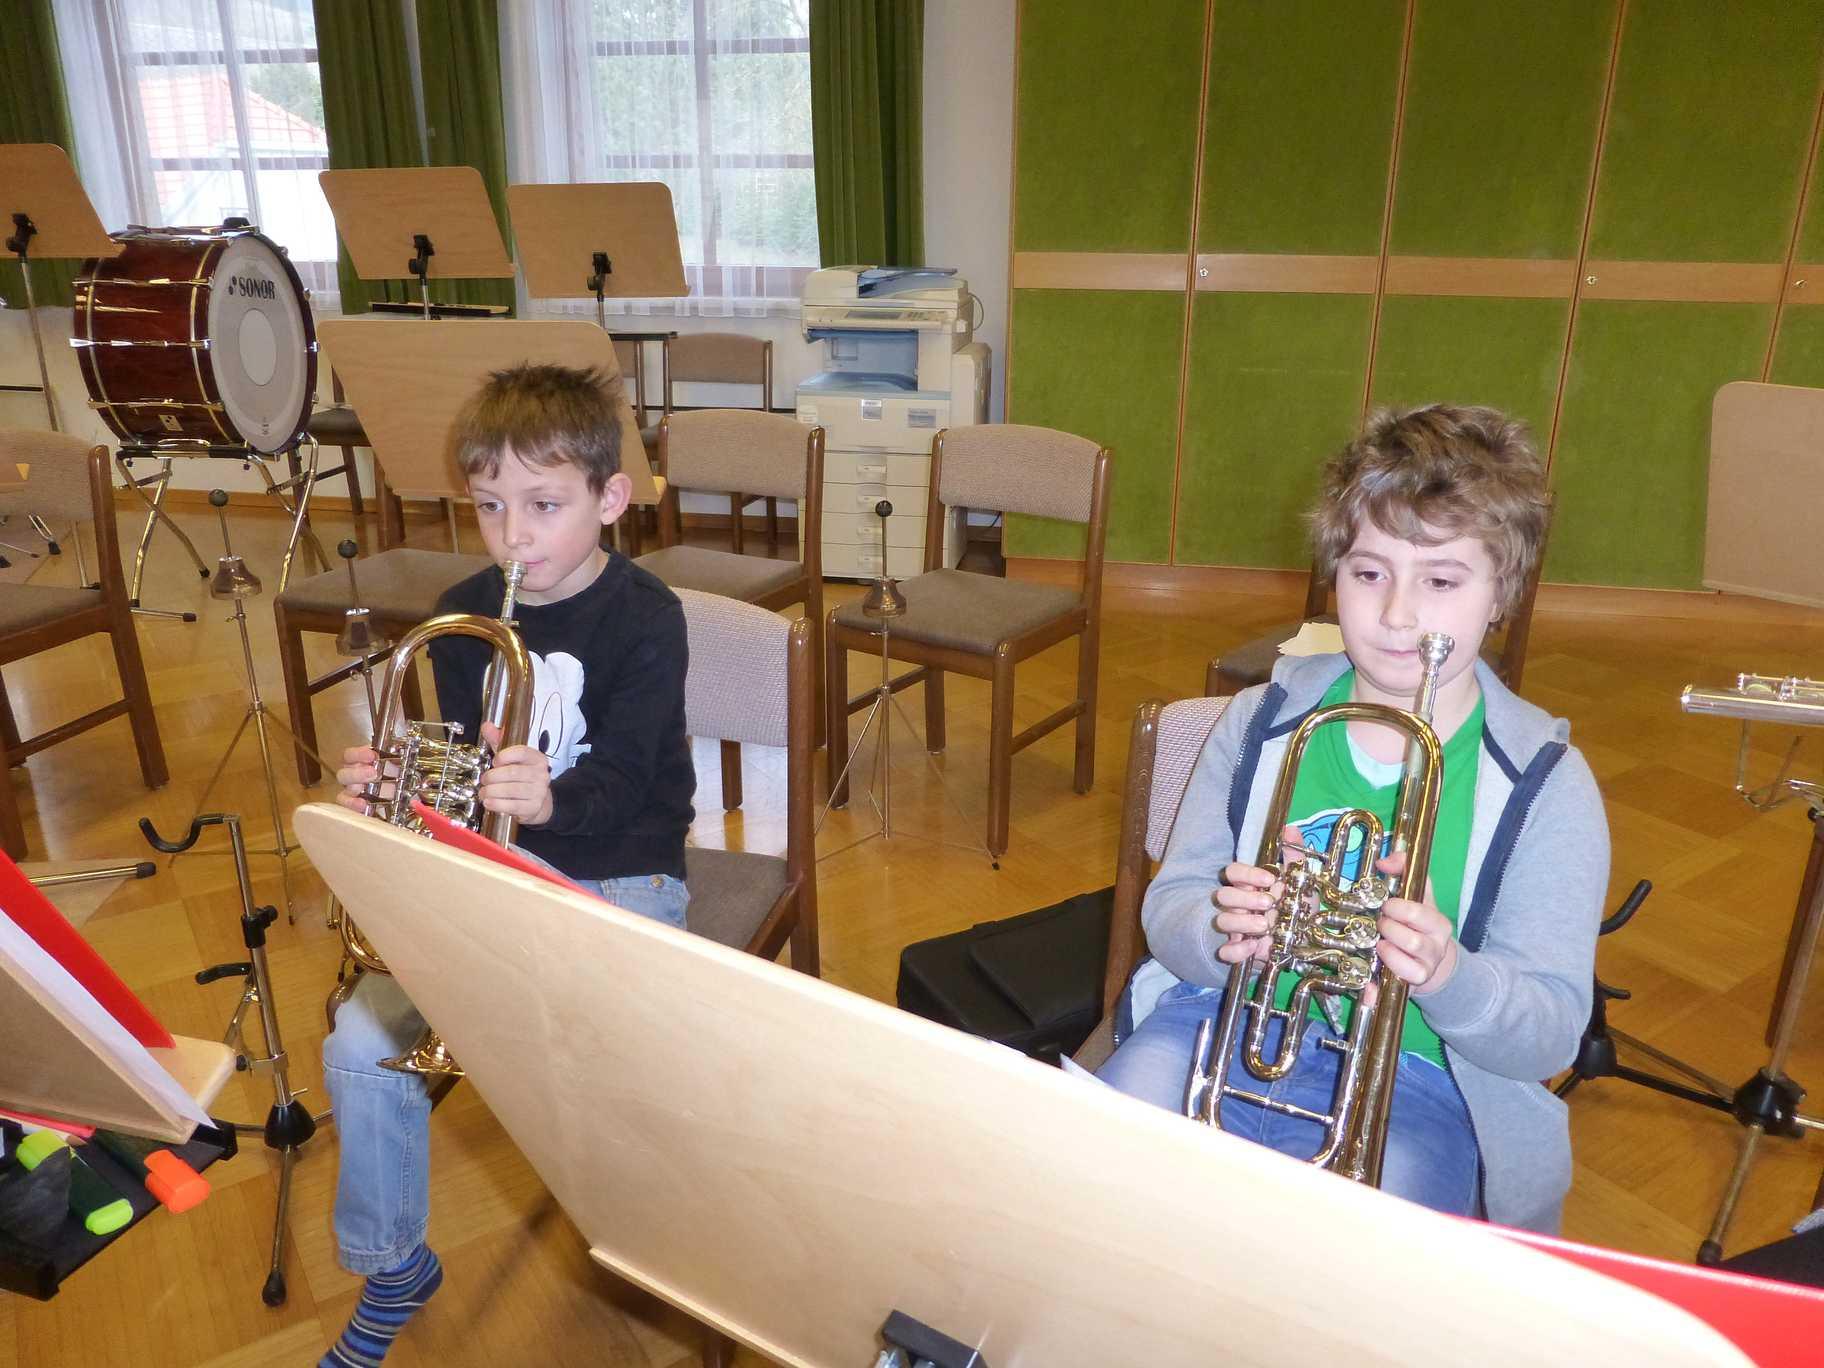 Jungmusikergruppe März 2016